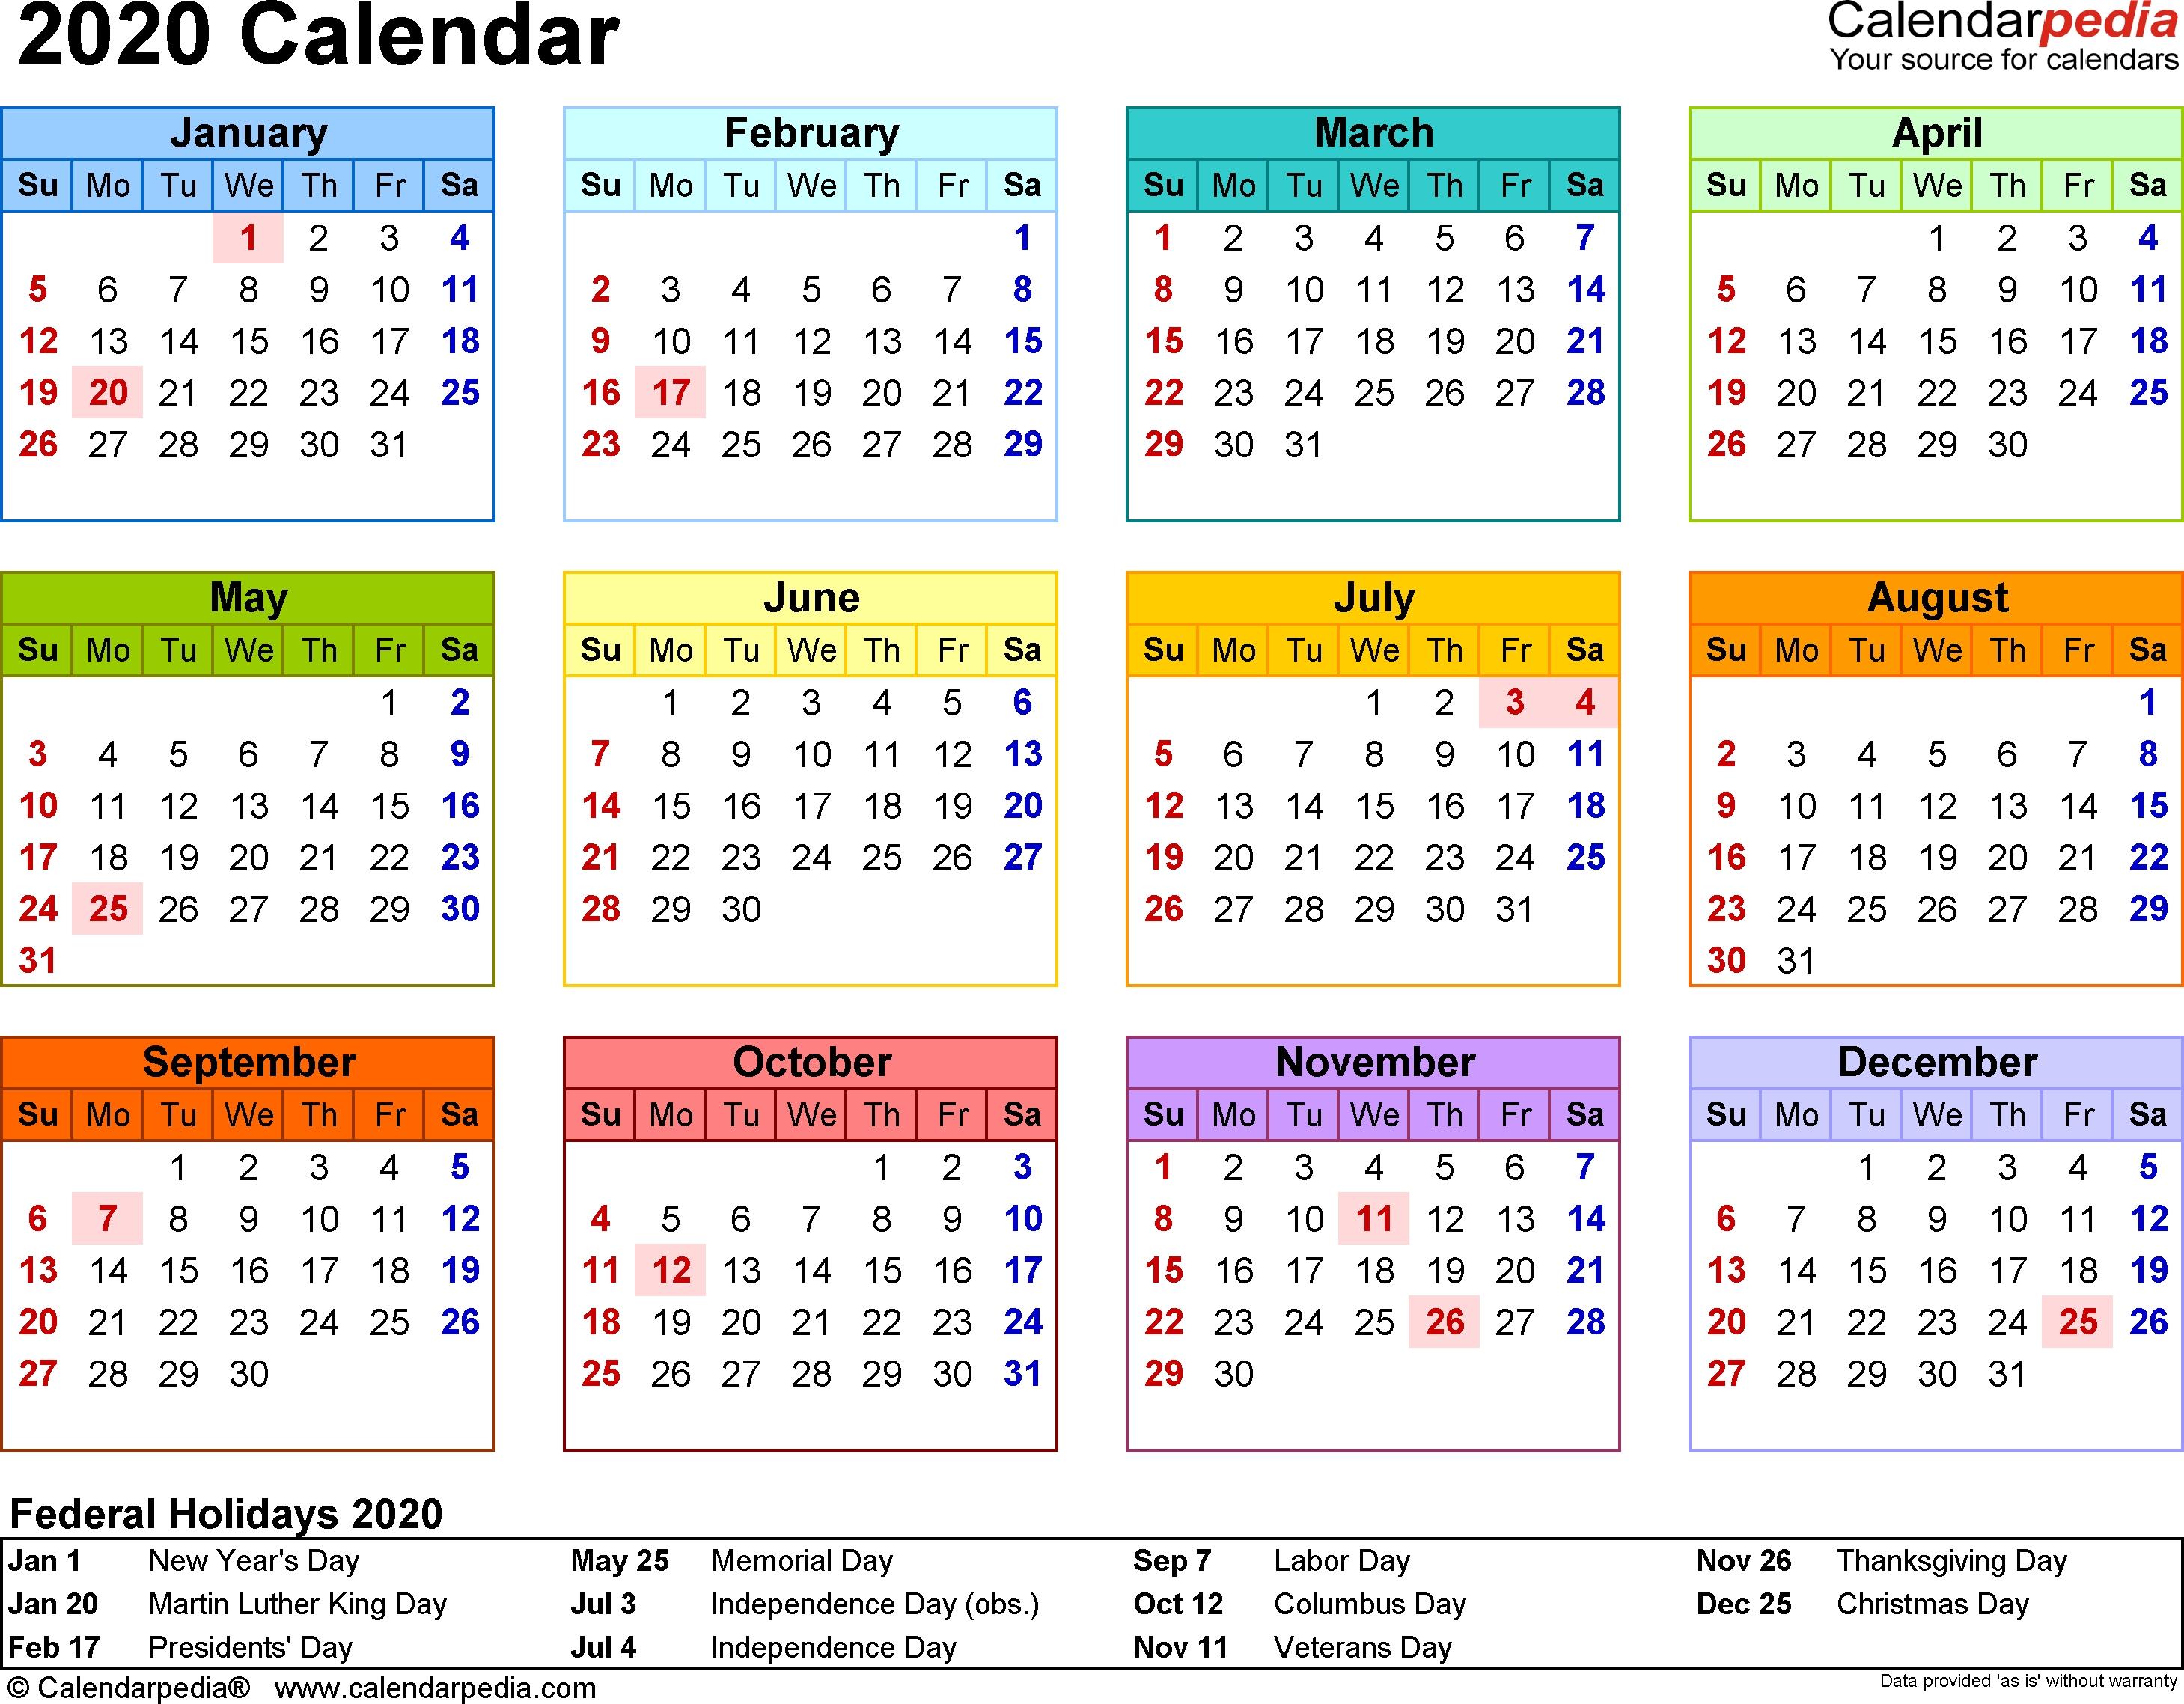 2020 Calendar Pdf - 17 Free Printable Calendar Templates in Free Printable Weekly Calendar 2020